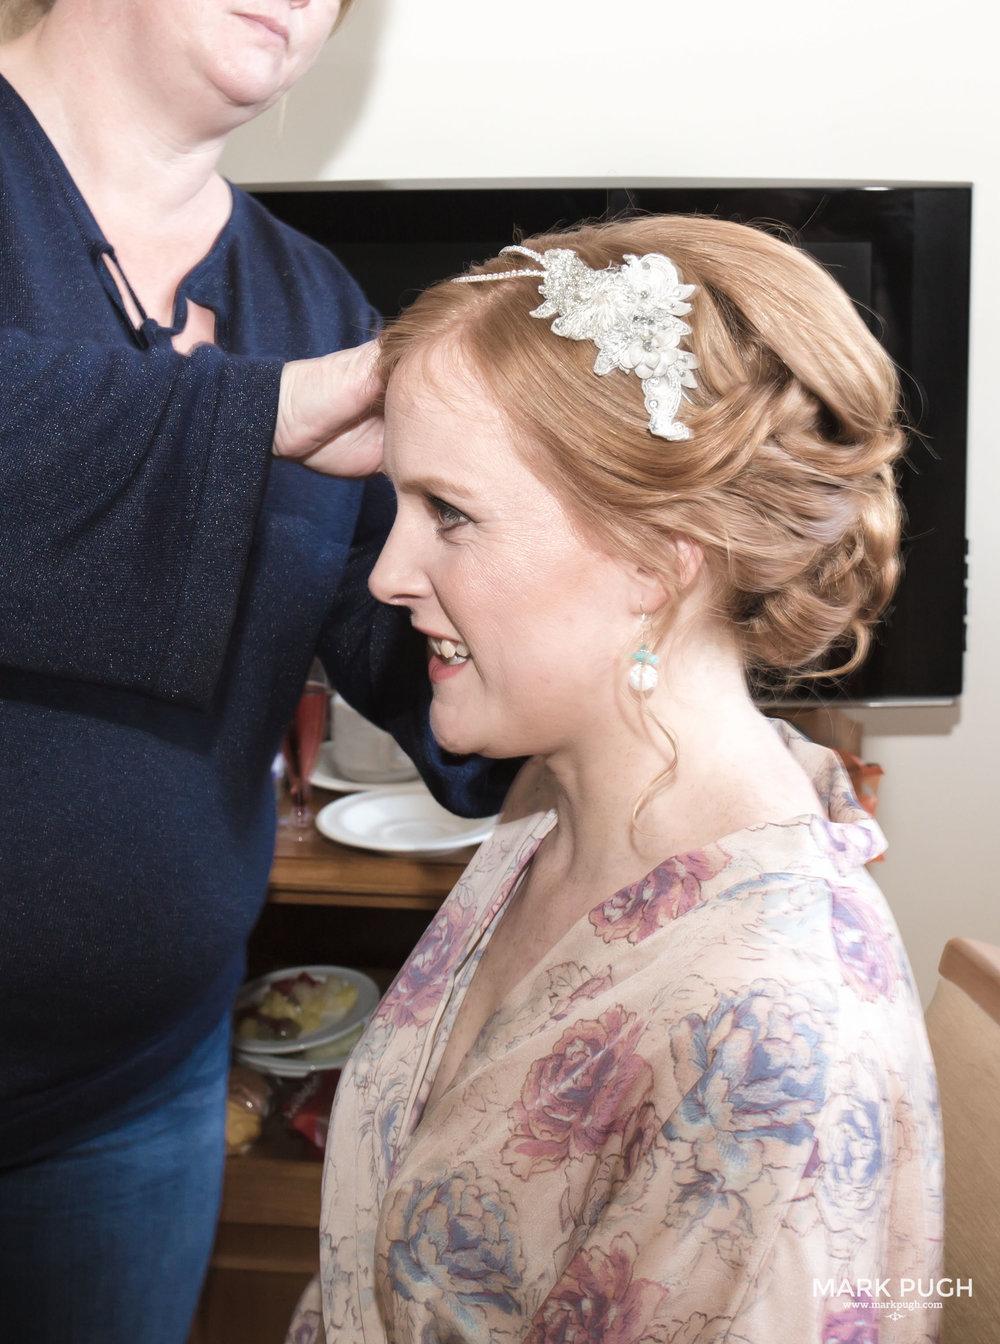 027 - Fay and Craig - fineART Wedding Photography at Stoke Rochford Hall NG33 5EJ by www.markpugh.com Mark Pugh of www.mpmedia.co.uk_.JPG